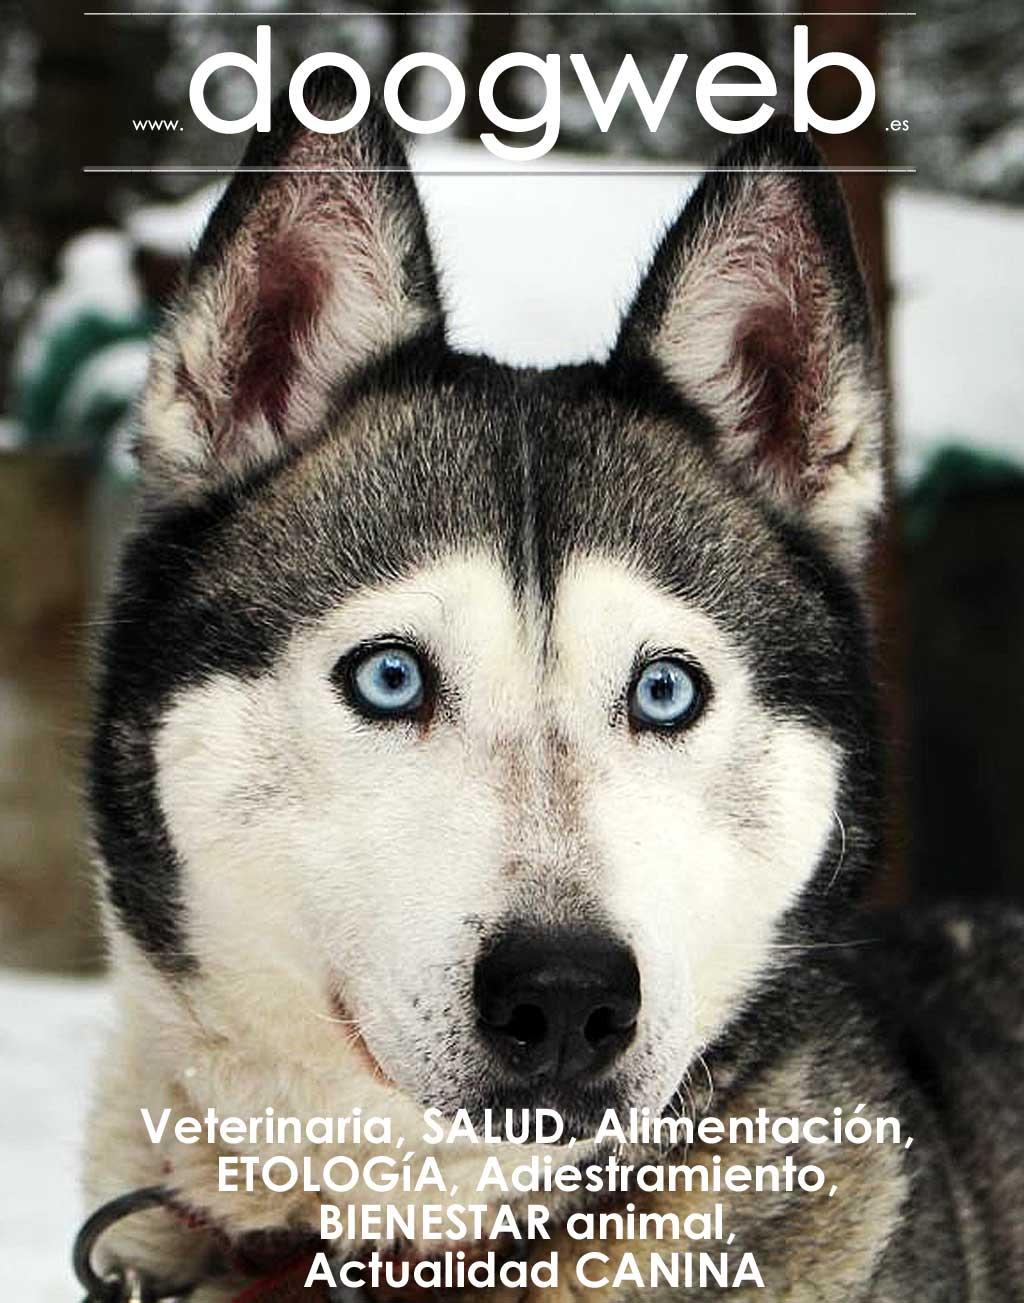 Revista gratis de perros de Doogweb 765.